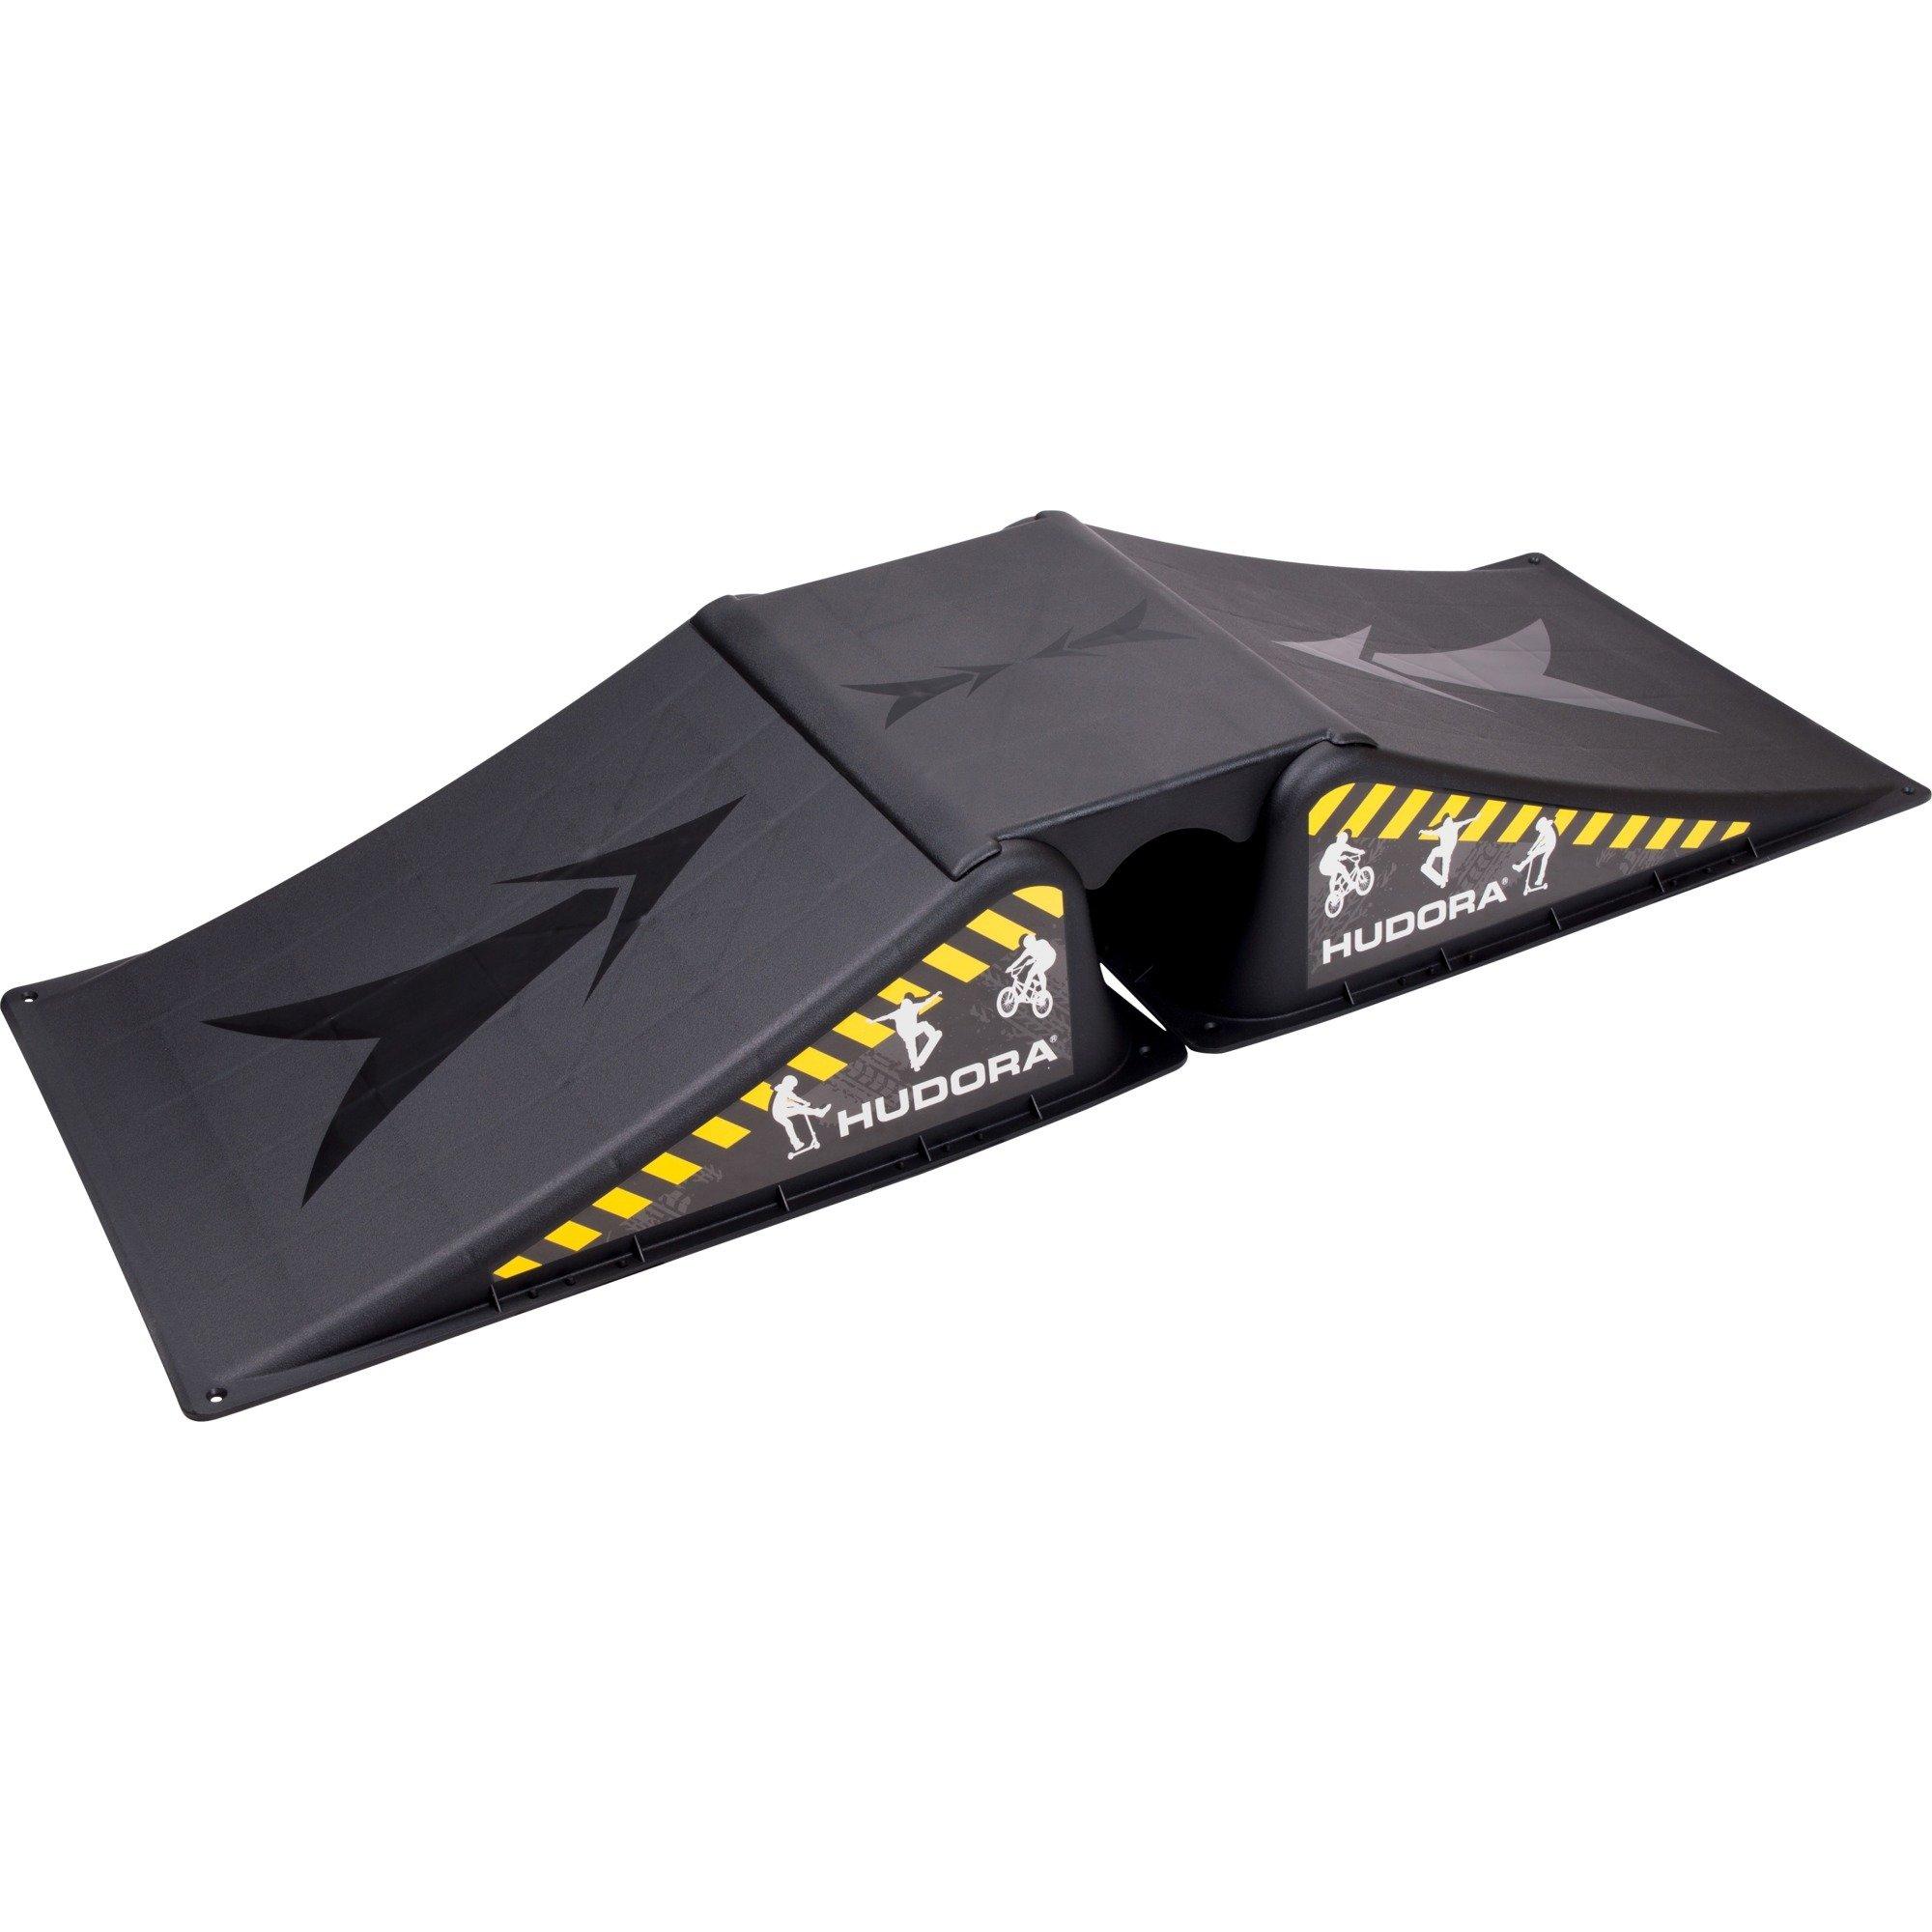 11116 2pieza(s) Negro rampa de monopatín